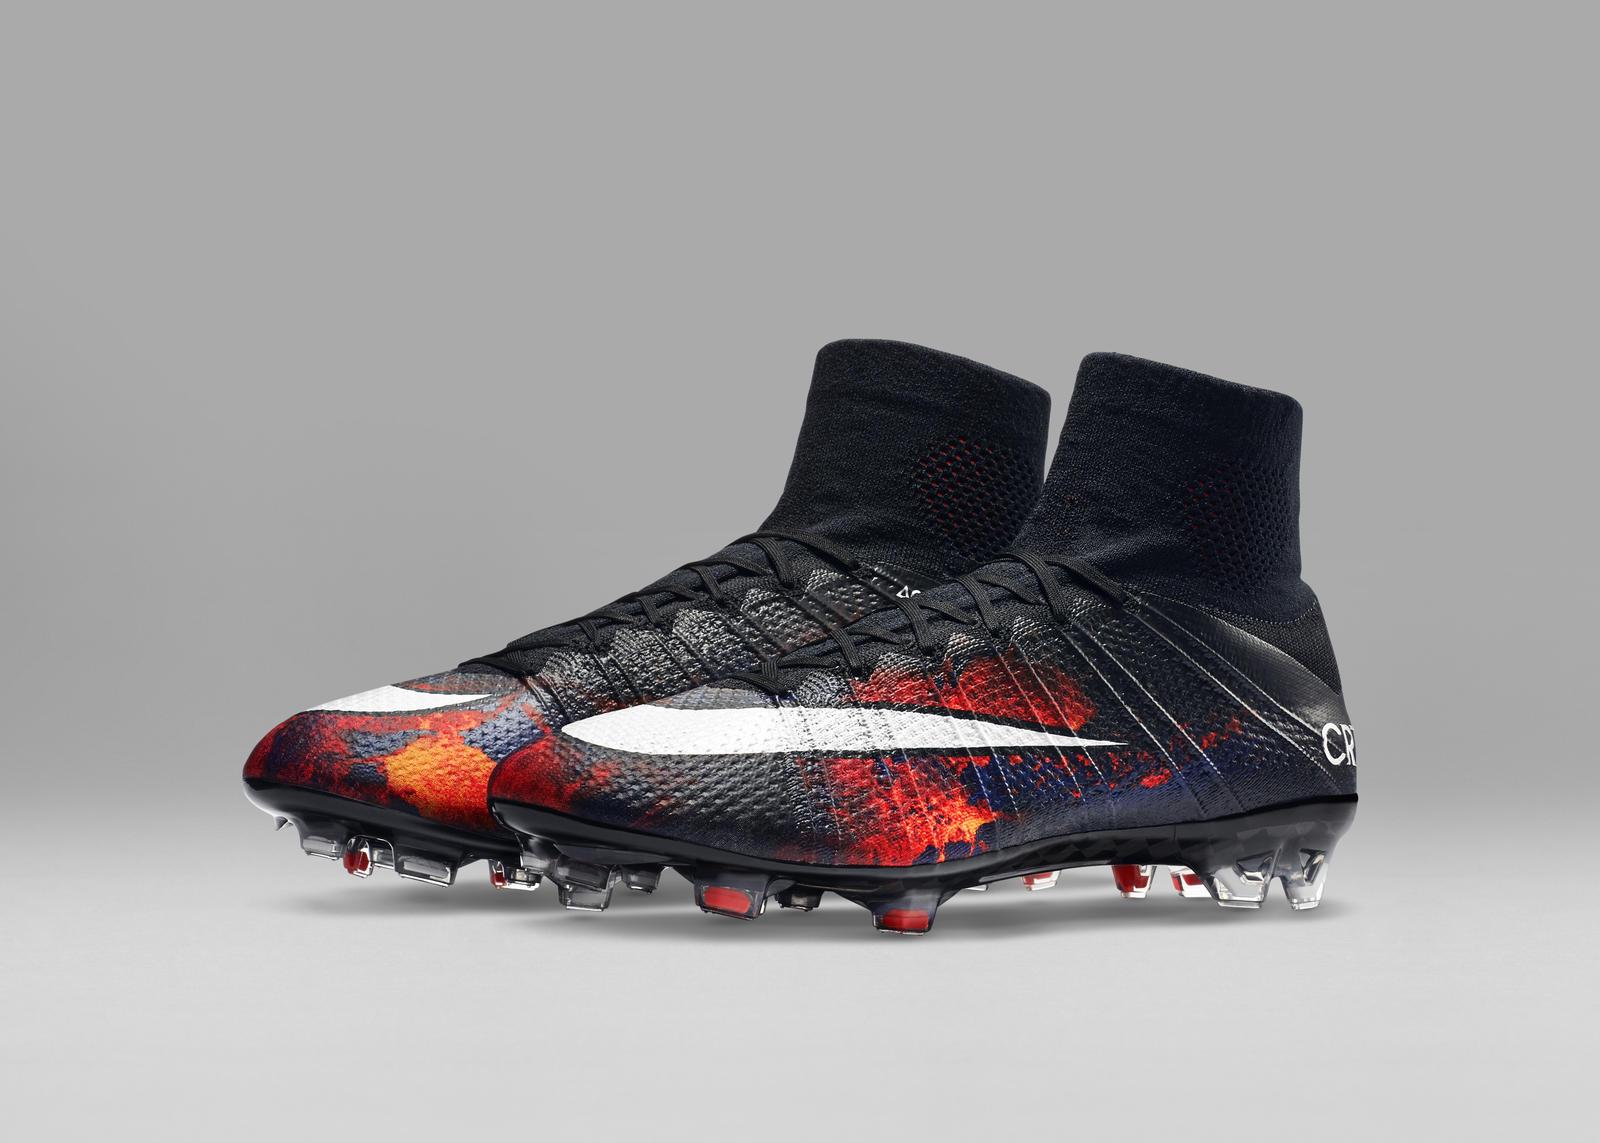 Nike-Football-Soccer-CR7-MERCURIAL-SUPERFLY-E 4dafa8c6832bf